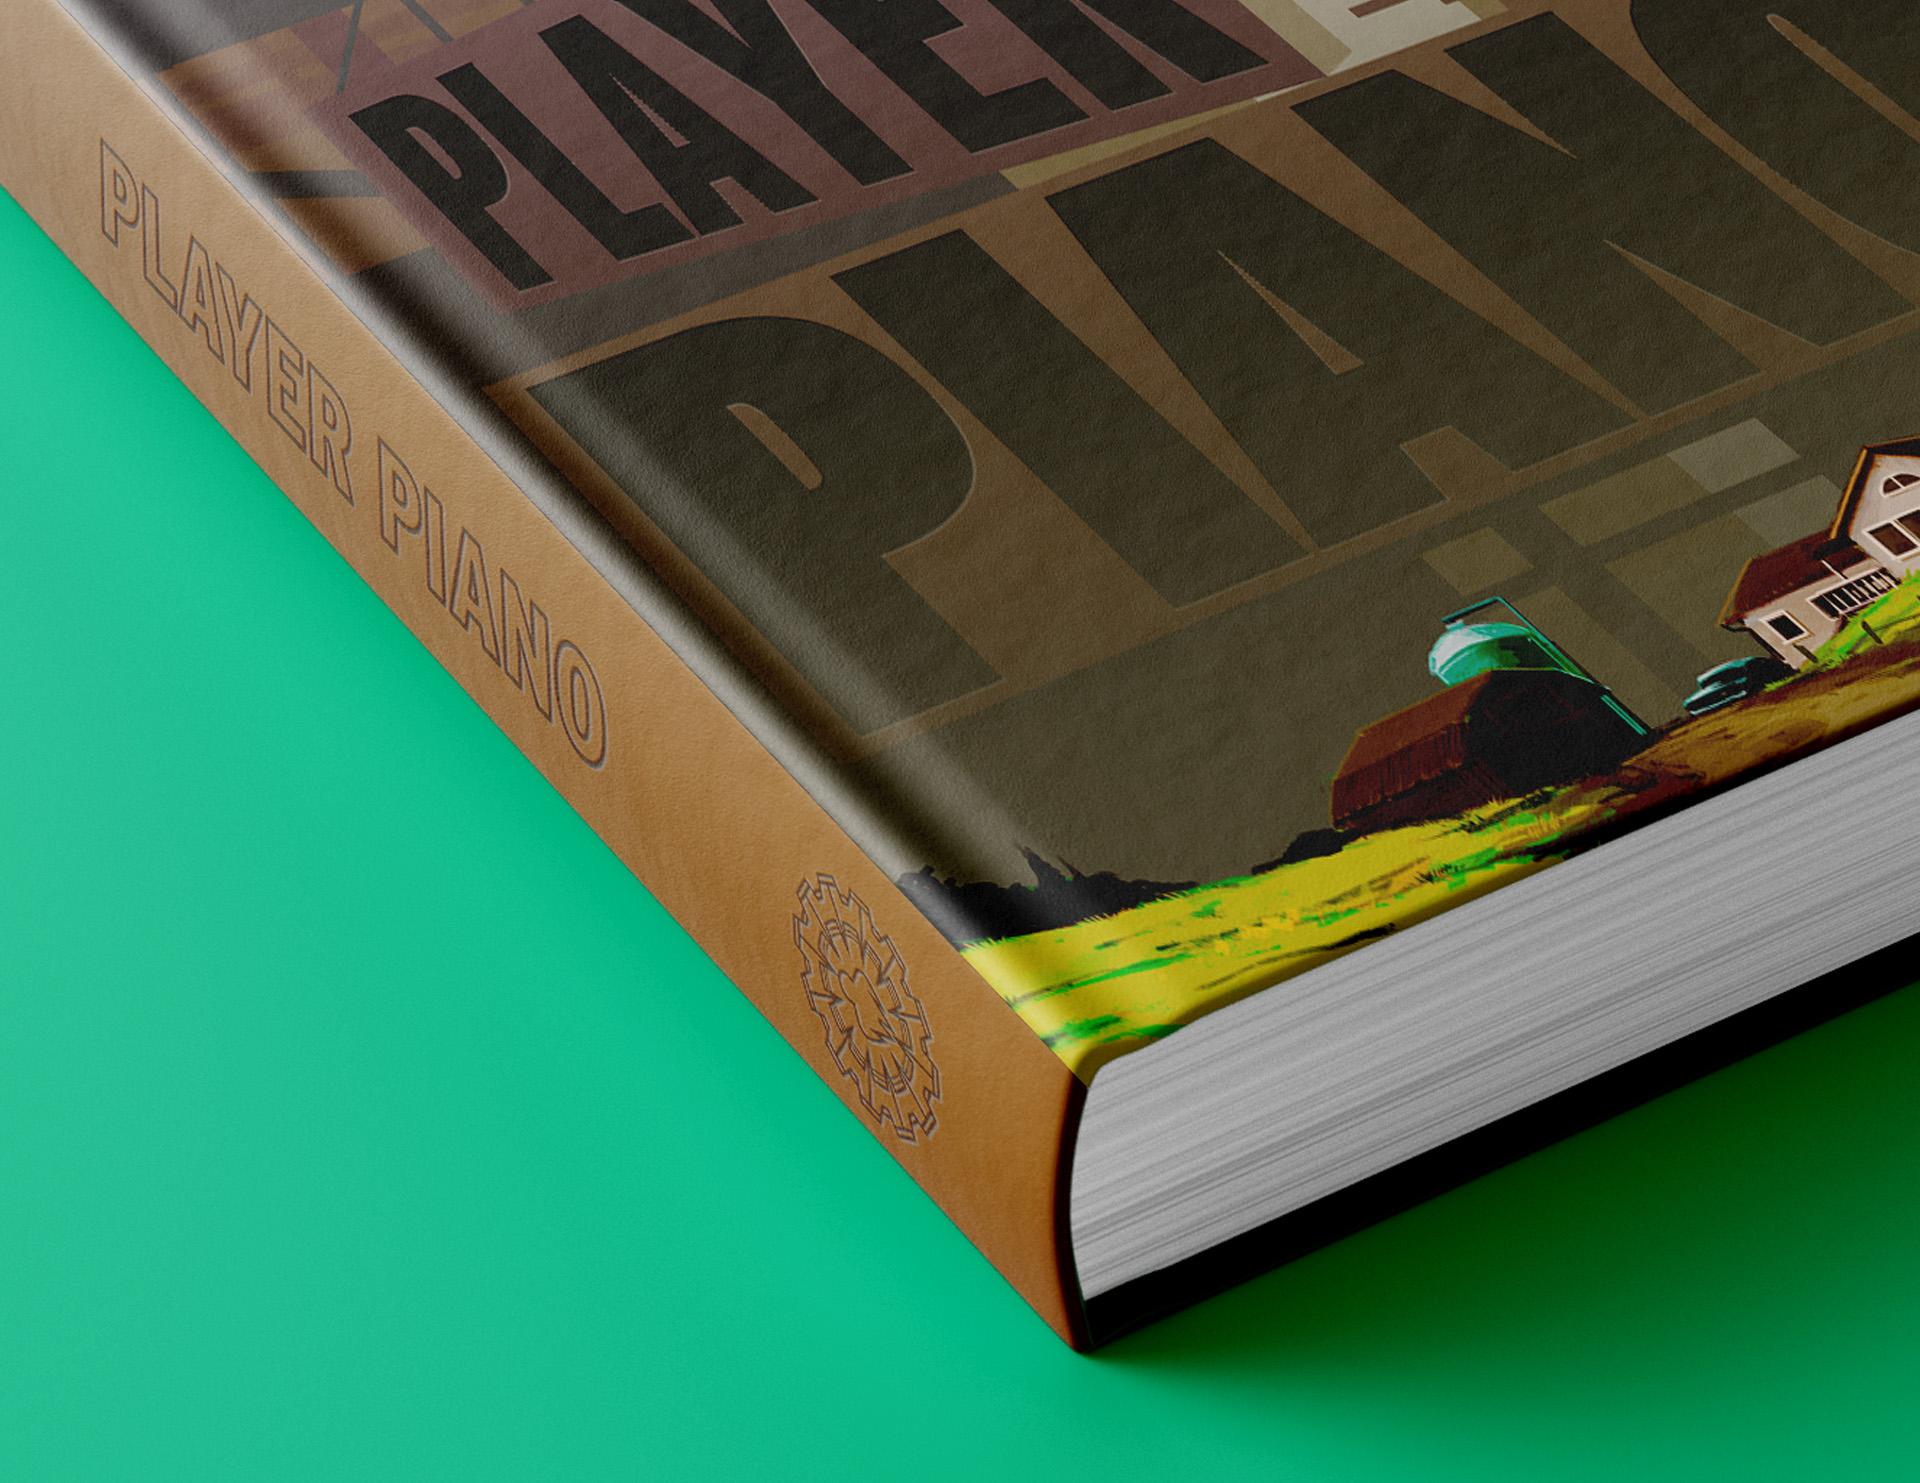 Wildjam_VonnegutBooks_PlayerPiano_Mock02_1920